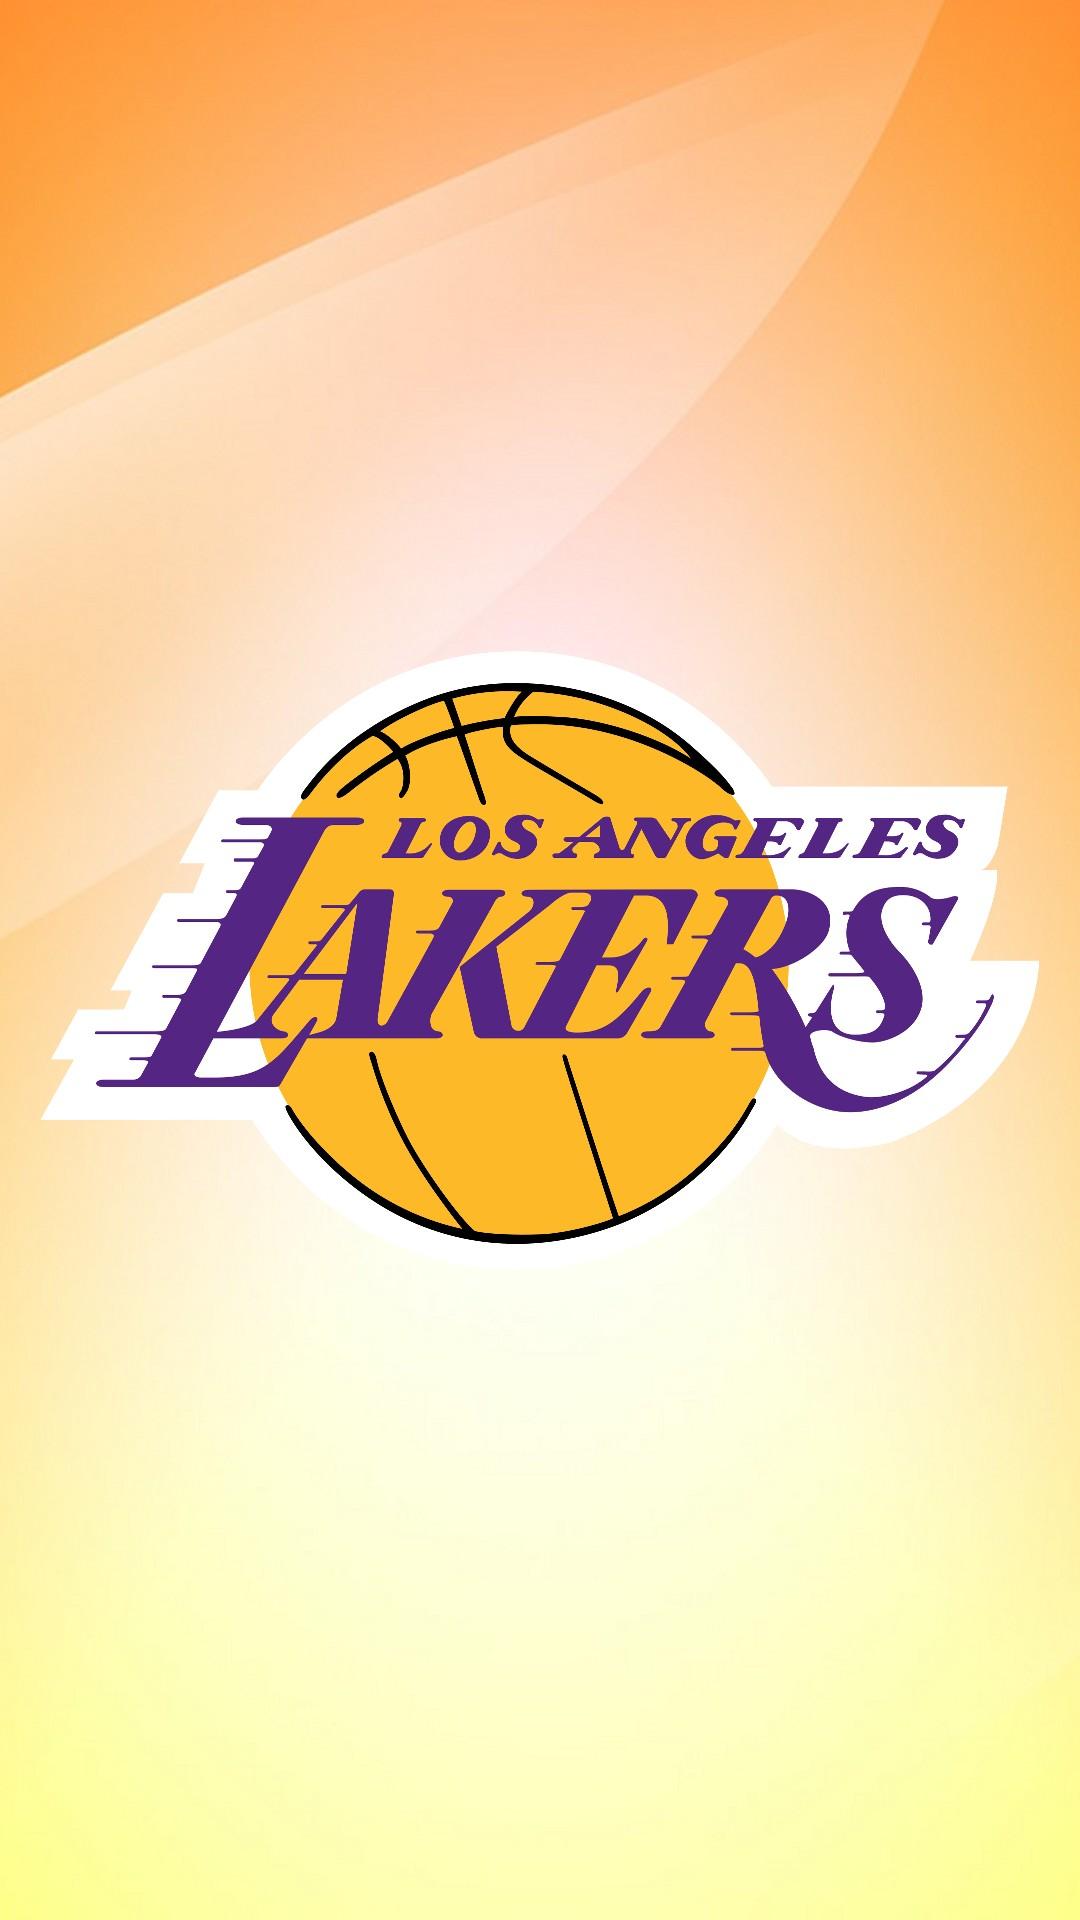 LA Lakers iPhone Screen Lock Wallpaper   2020 NBA iPhone Wallpaper 1080x1920